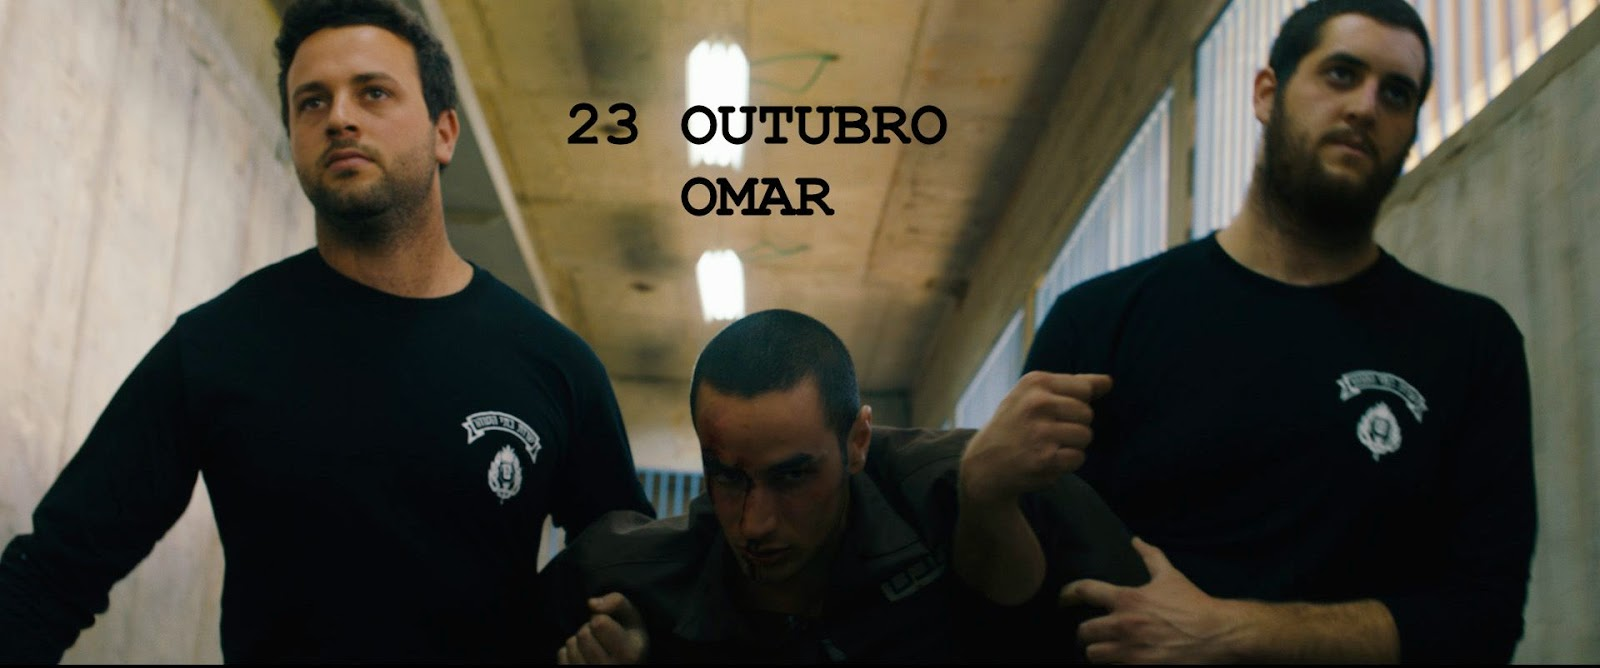 Omar (2013) de Hany Abu-Assad